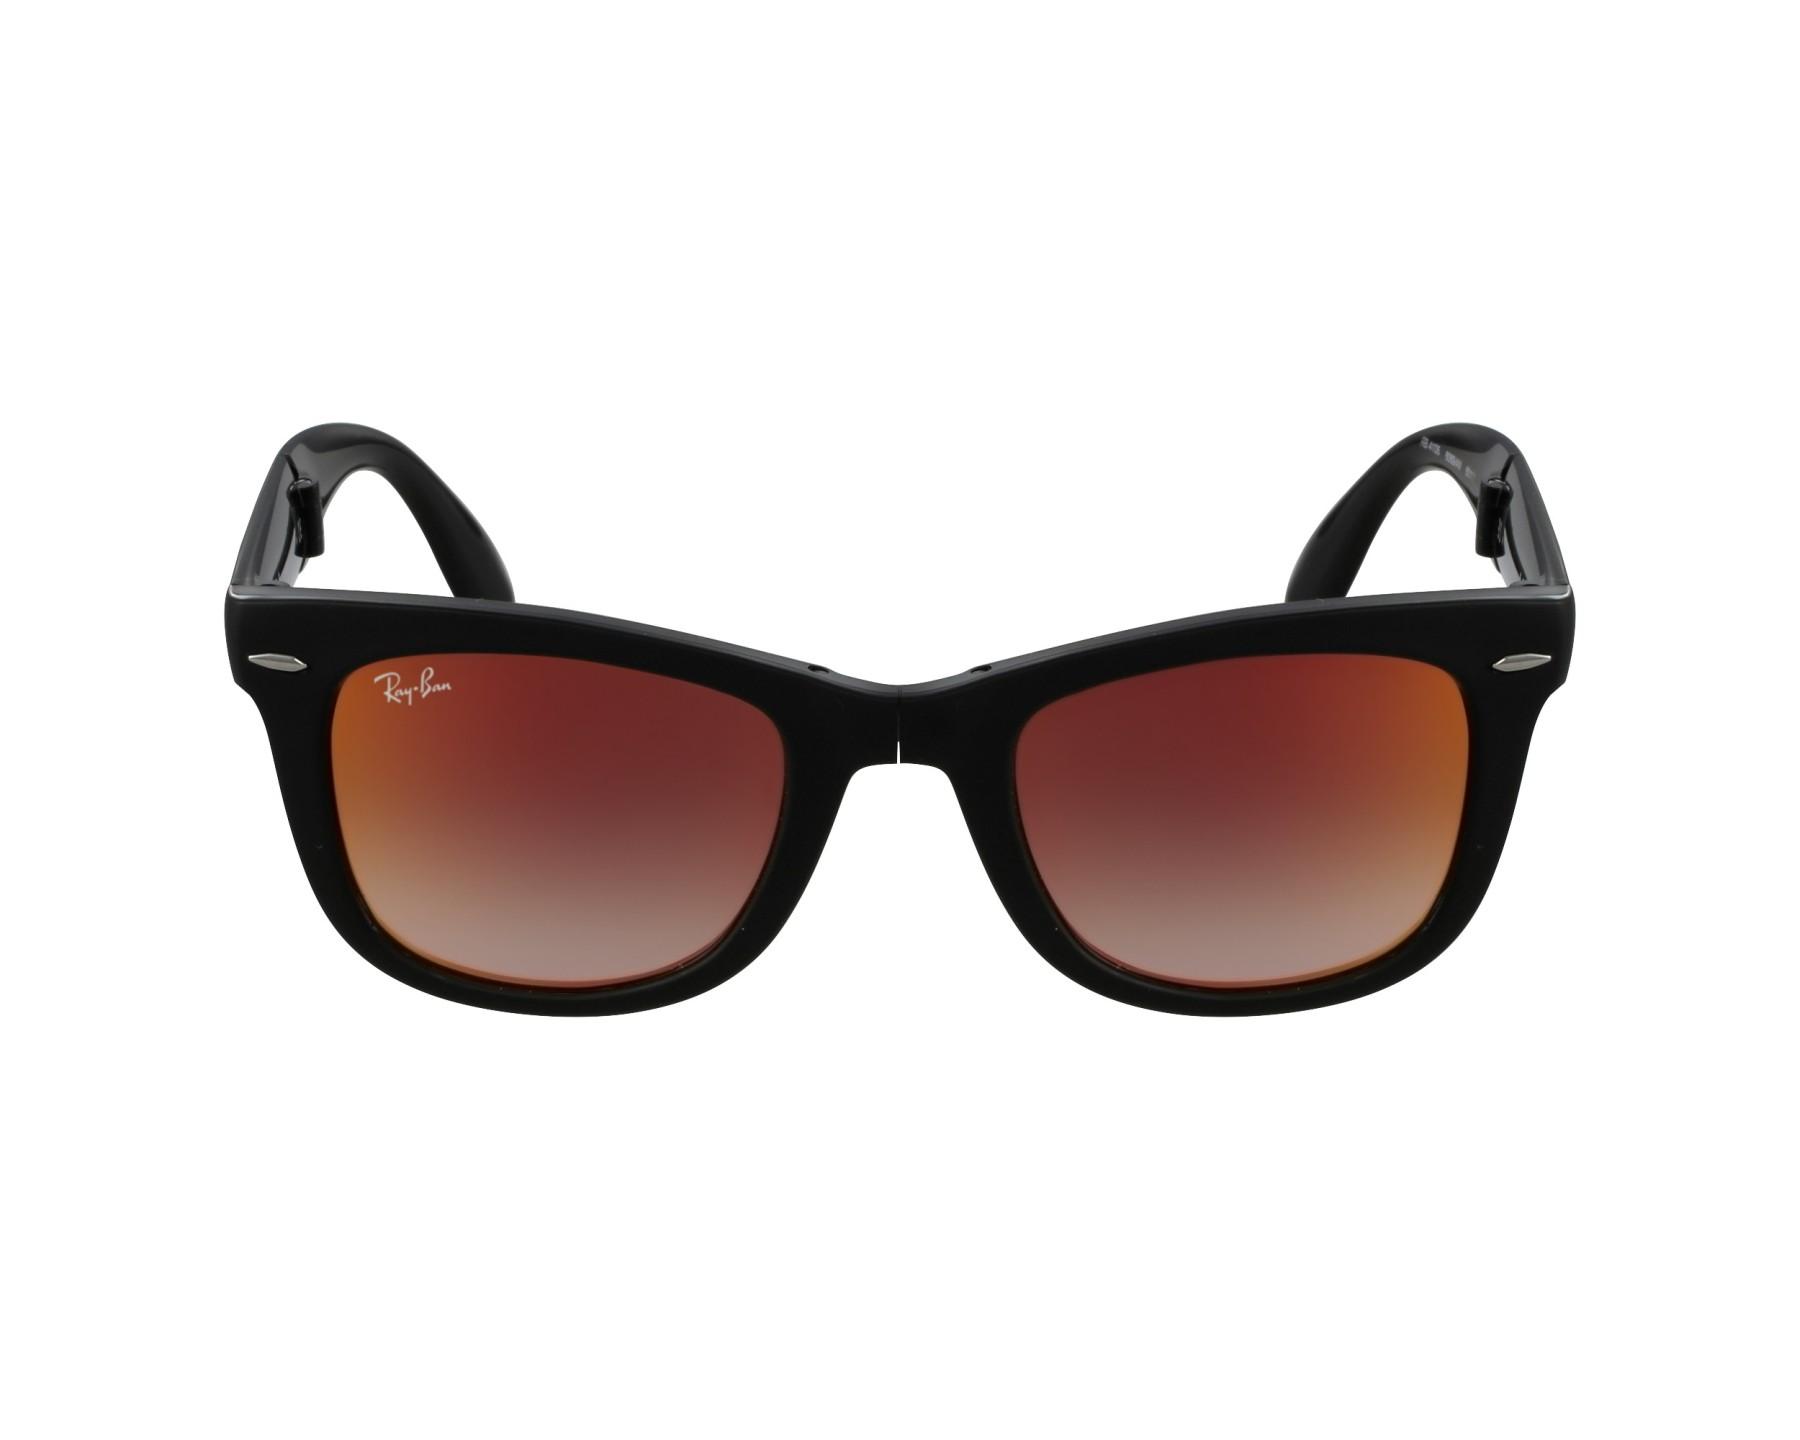 ac5c464e52 Gafas de Sol Ray-Ban Wayfarer Folding Classic RB-4105 6069/4W